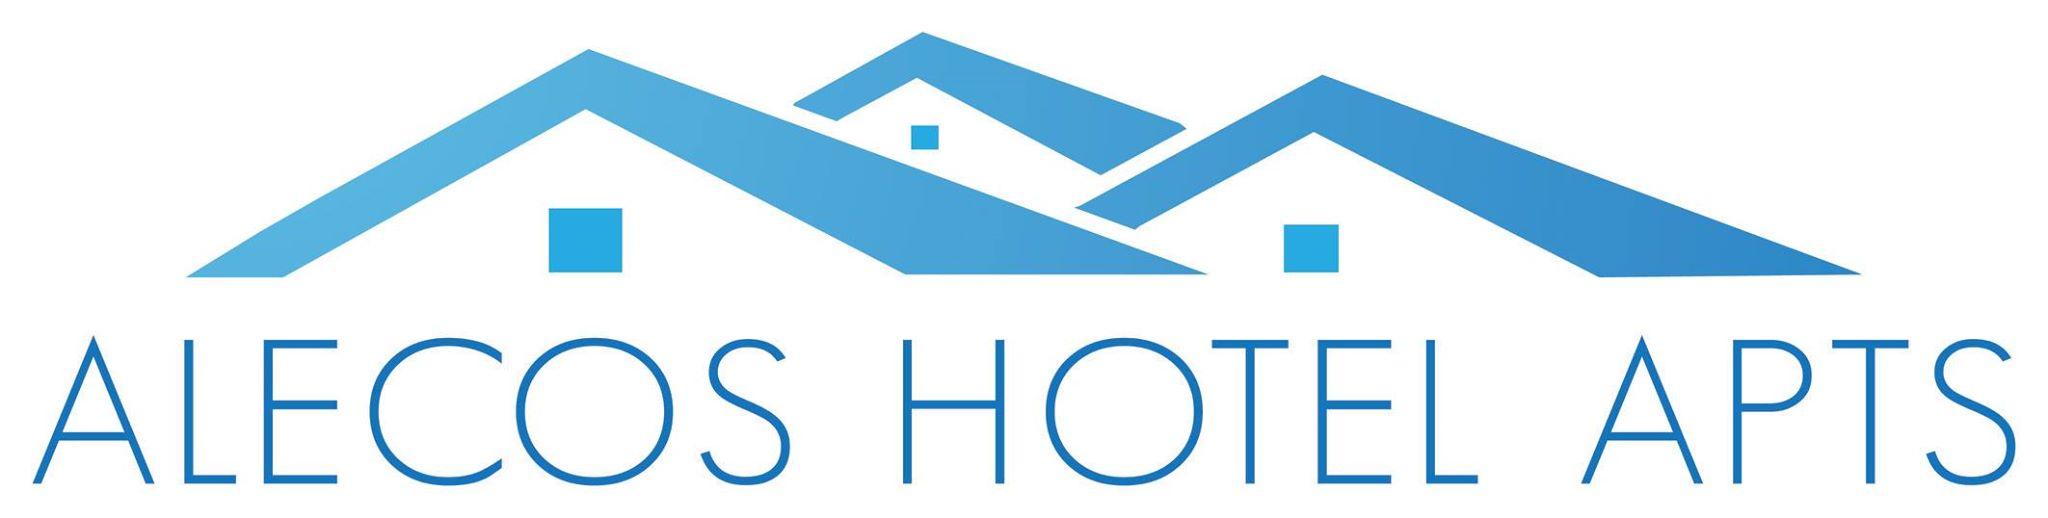 alecos hotel apartments logo